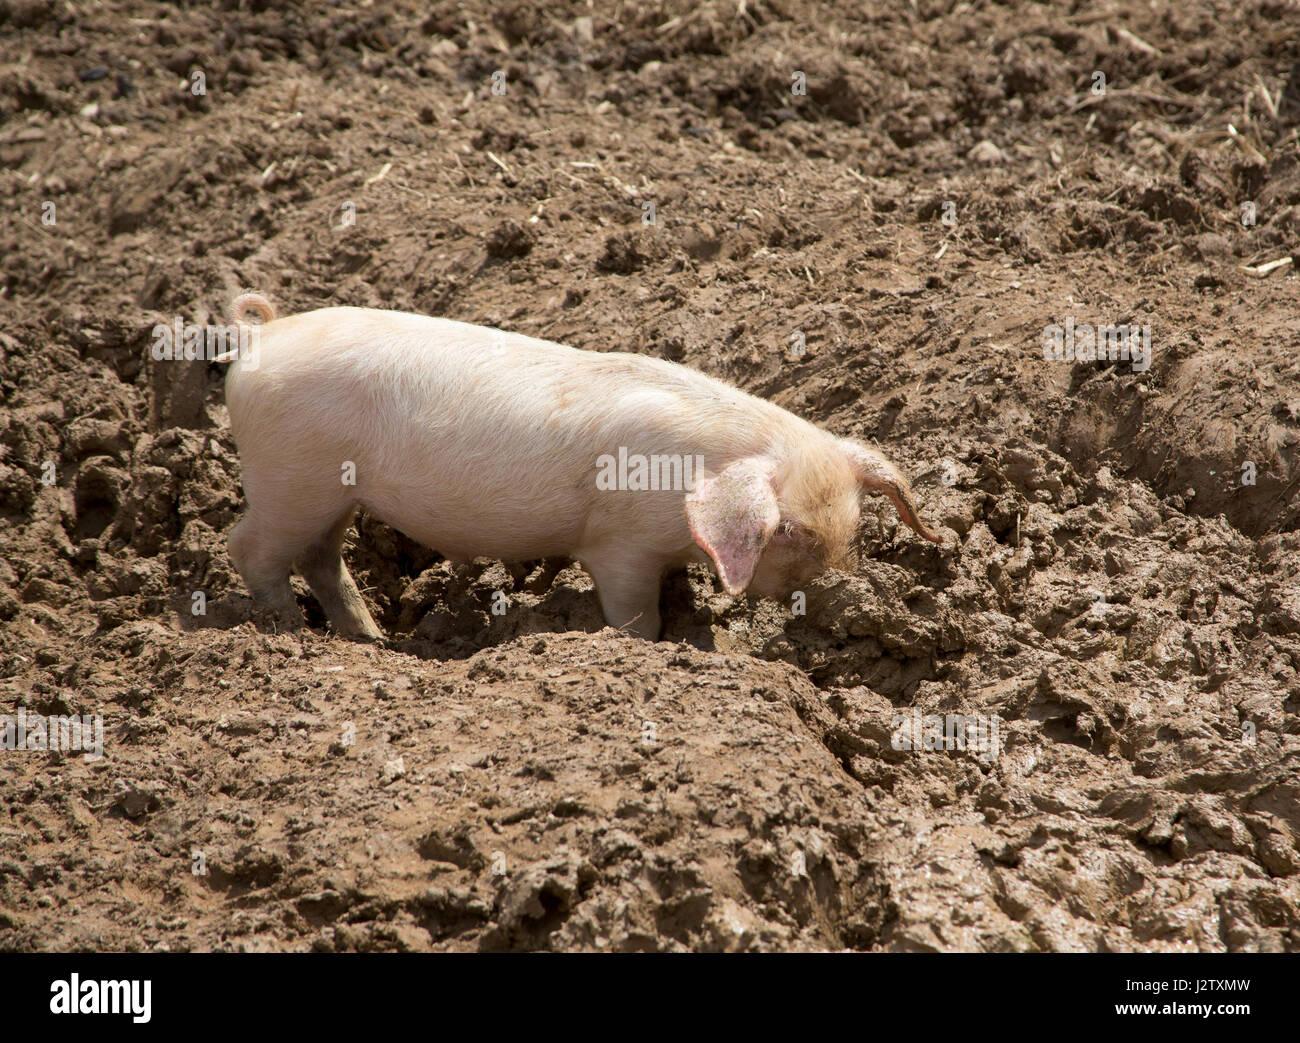 British Lop Pig, single piglet foraging in mud, Cornwall, UK - Stock Image